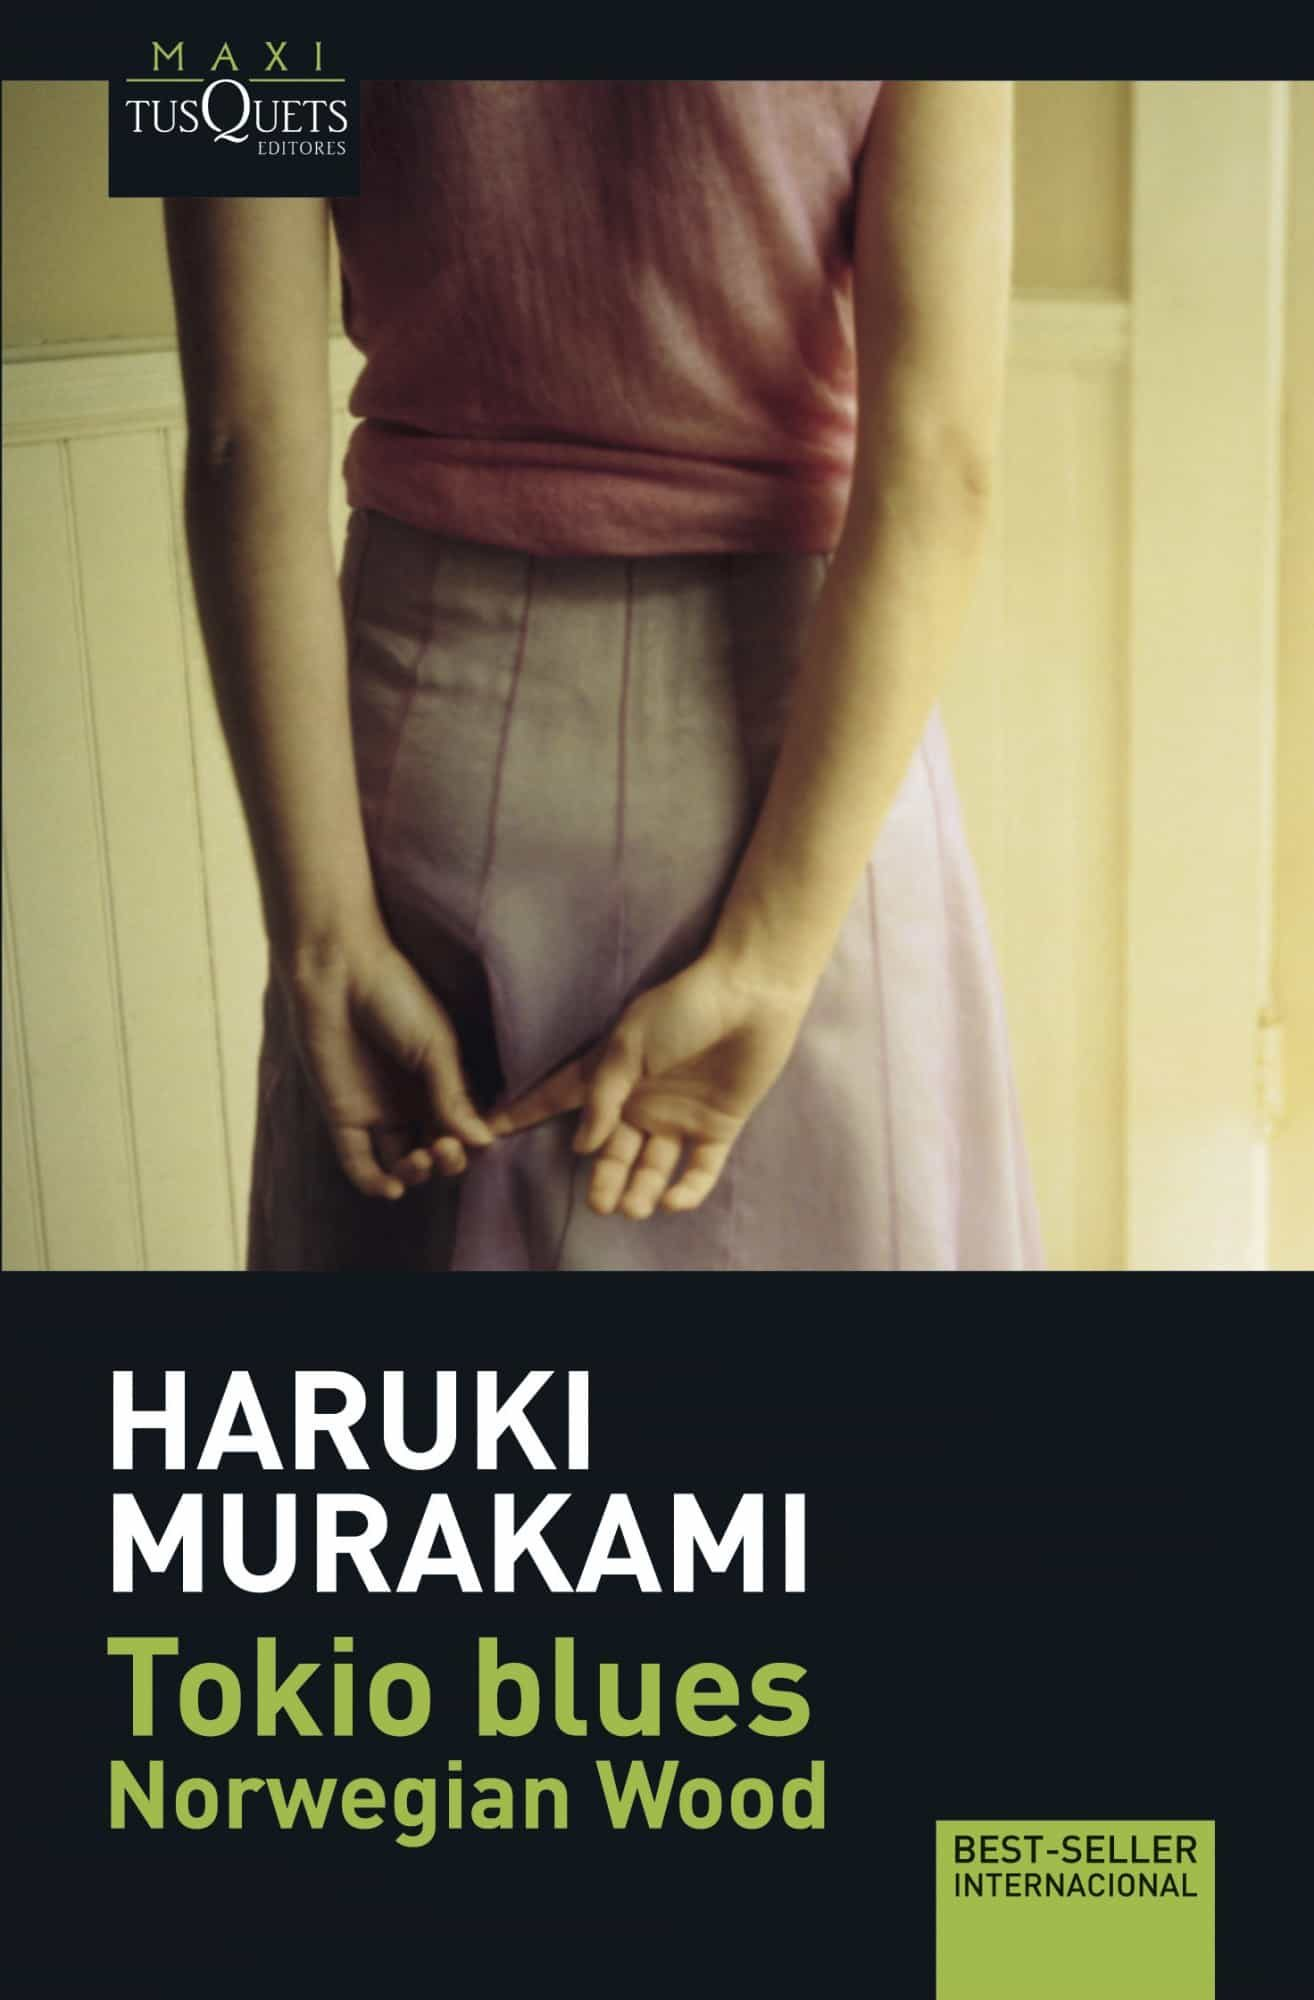 TOKIO BLUES (NORWEGIAN WOOD)   HARUKI MURAKAMI   Comprar libro 9788483835043